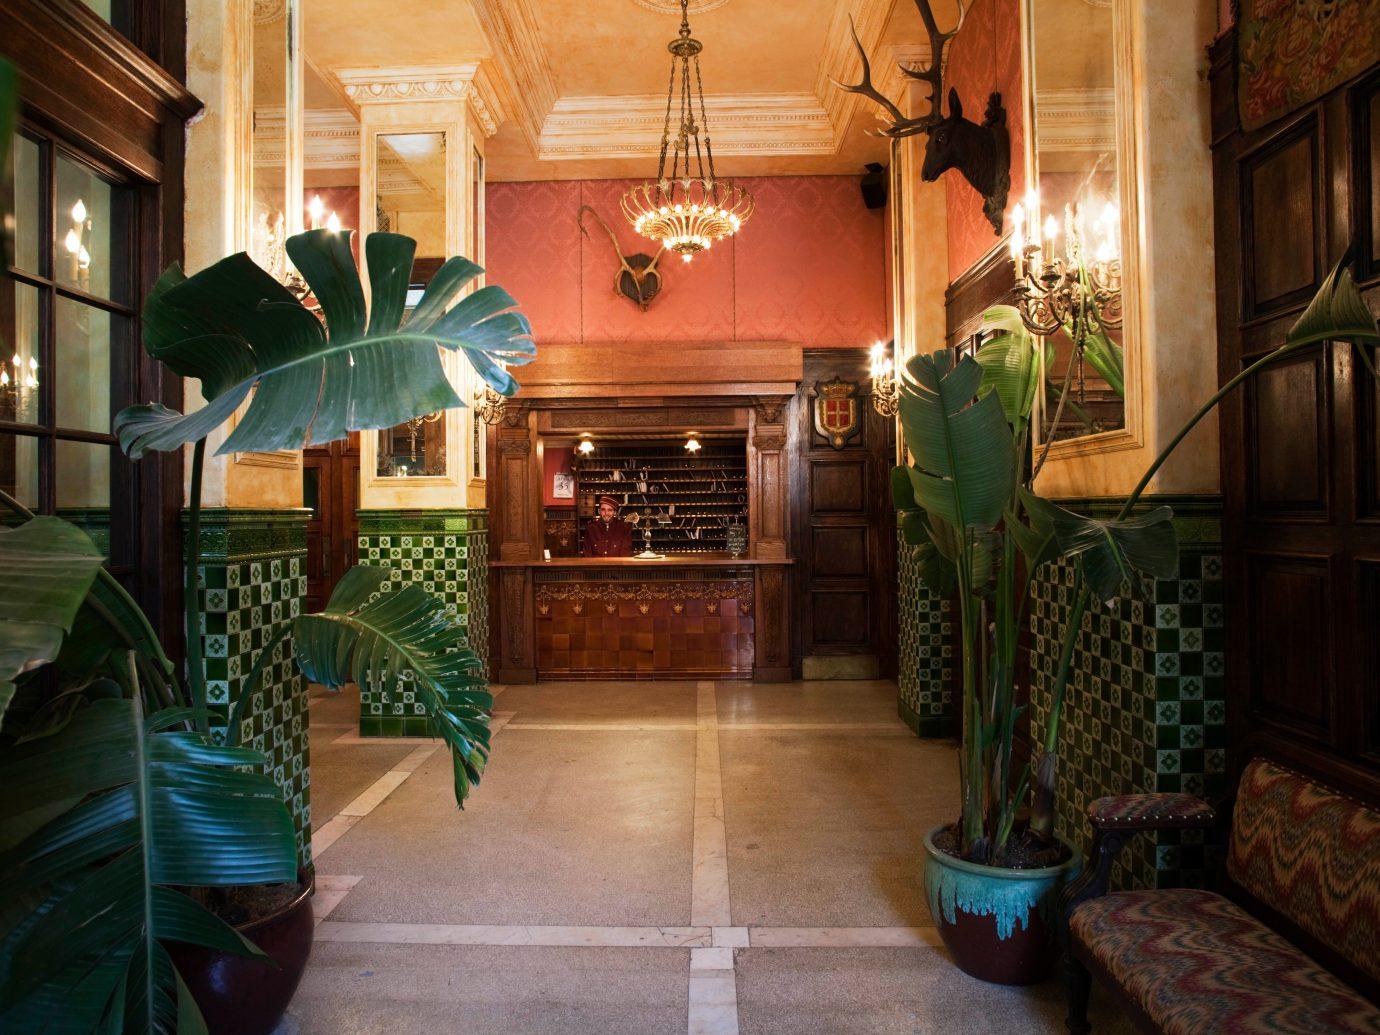 Budget Trip Ideas floor indoor room property estate Lobby house mansion home green interior design living room Resort cottage palace furniture